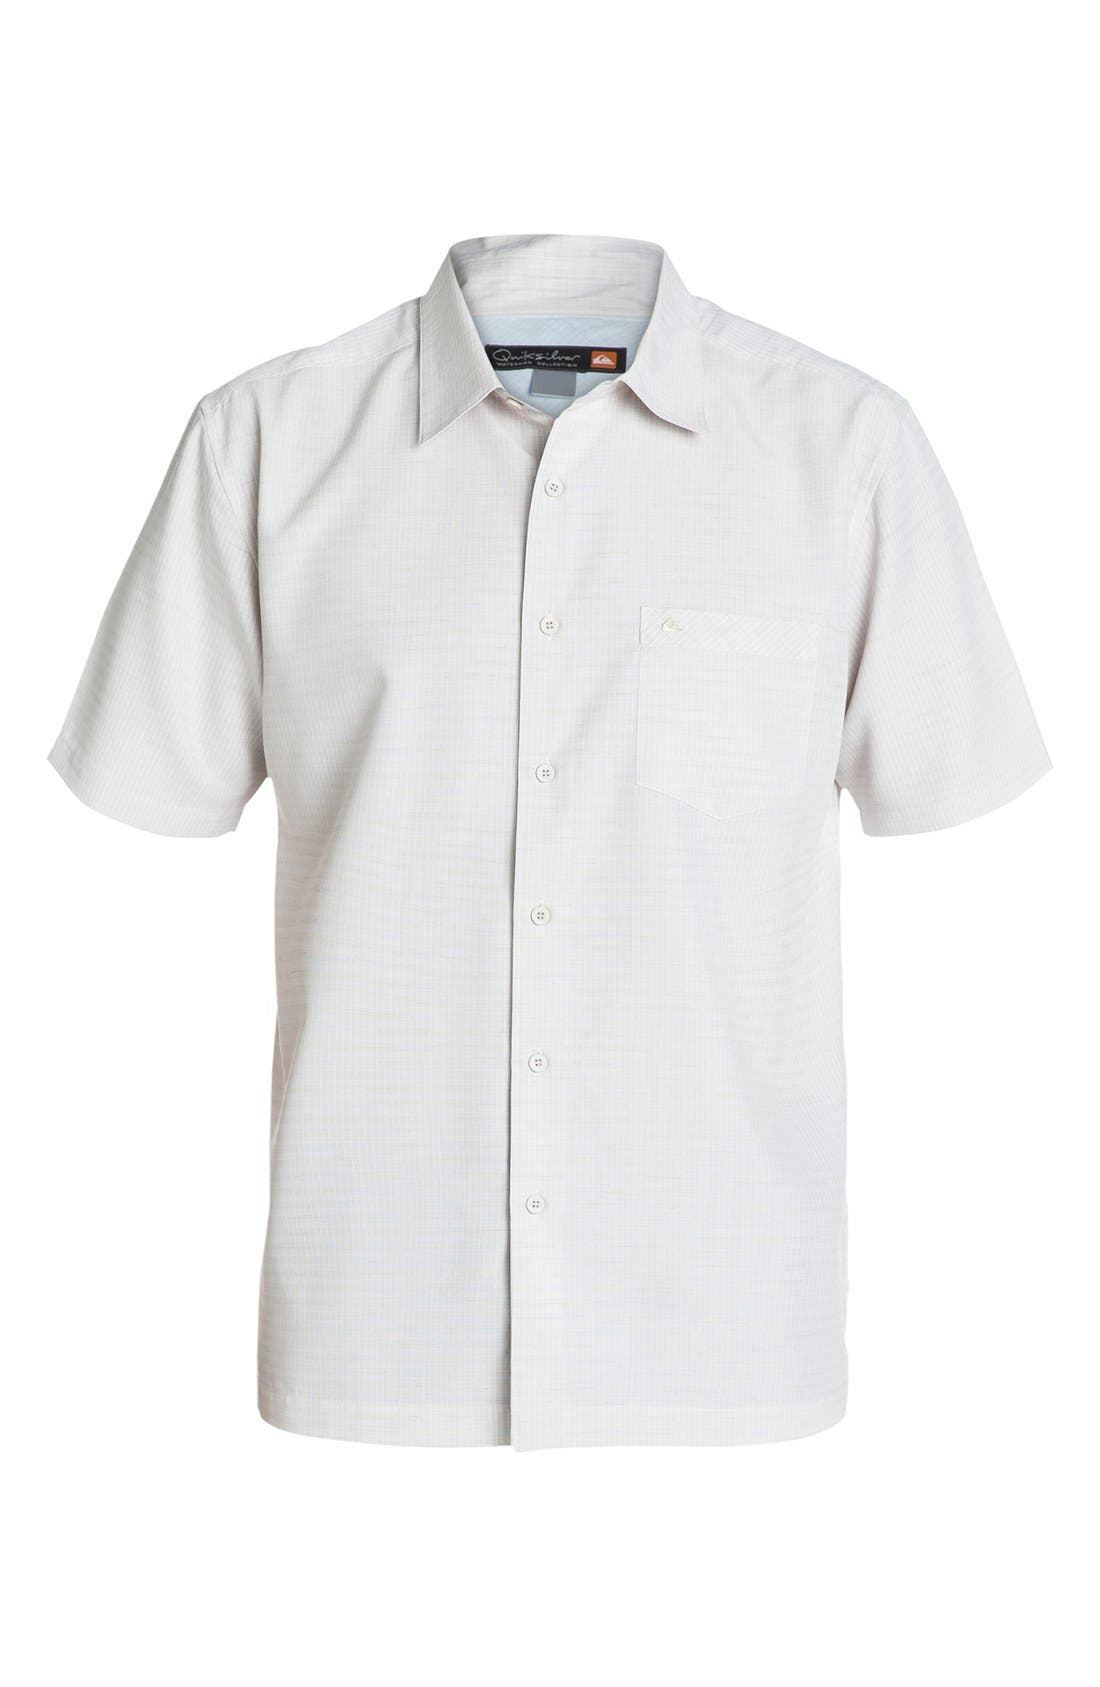 'Centinela 4' Short Sleeve Sport Shirt,                             Main thumbnail 6, color,